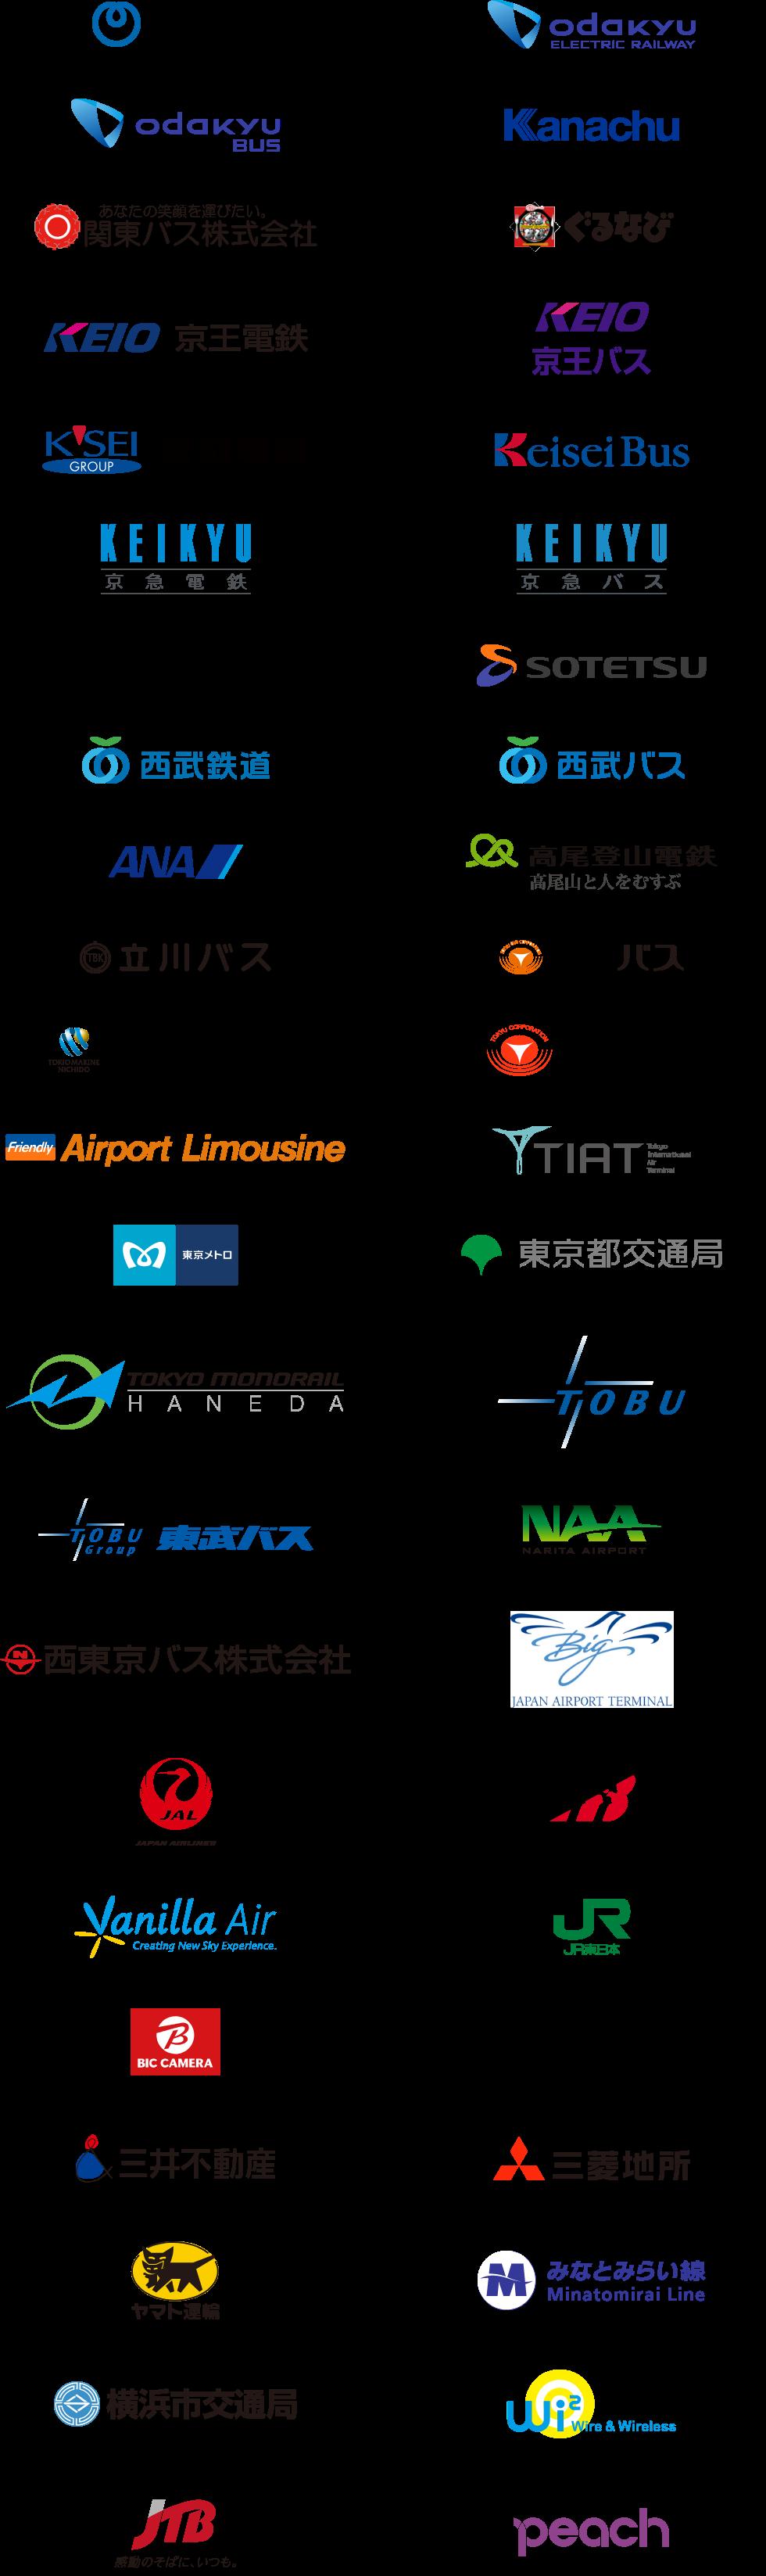 LIVE JAPAN PERFECT GUIDE TOKYO の趣旨に賛同する企業